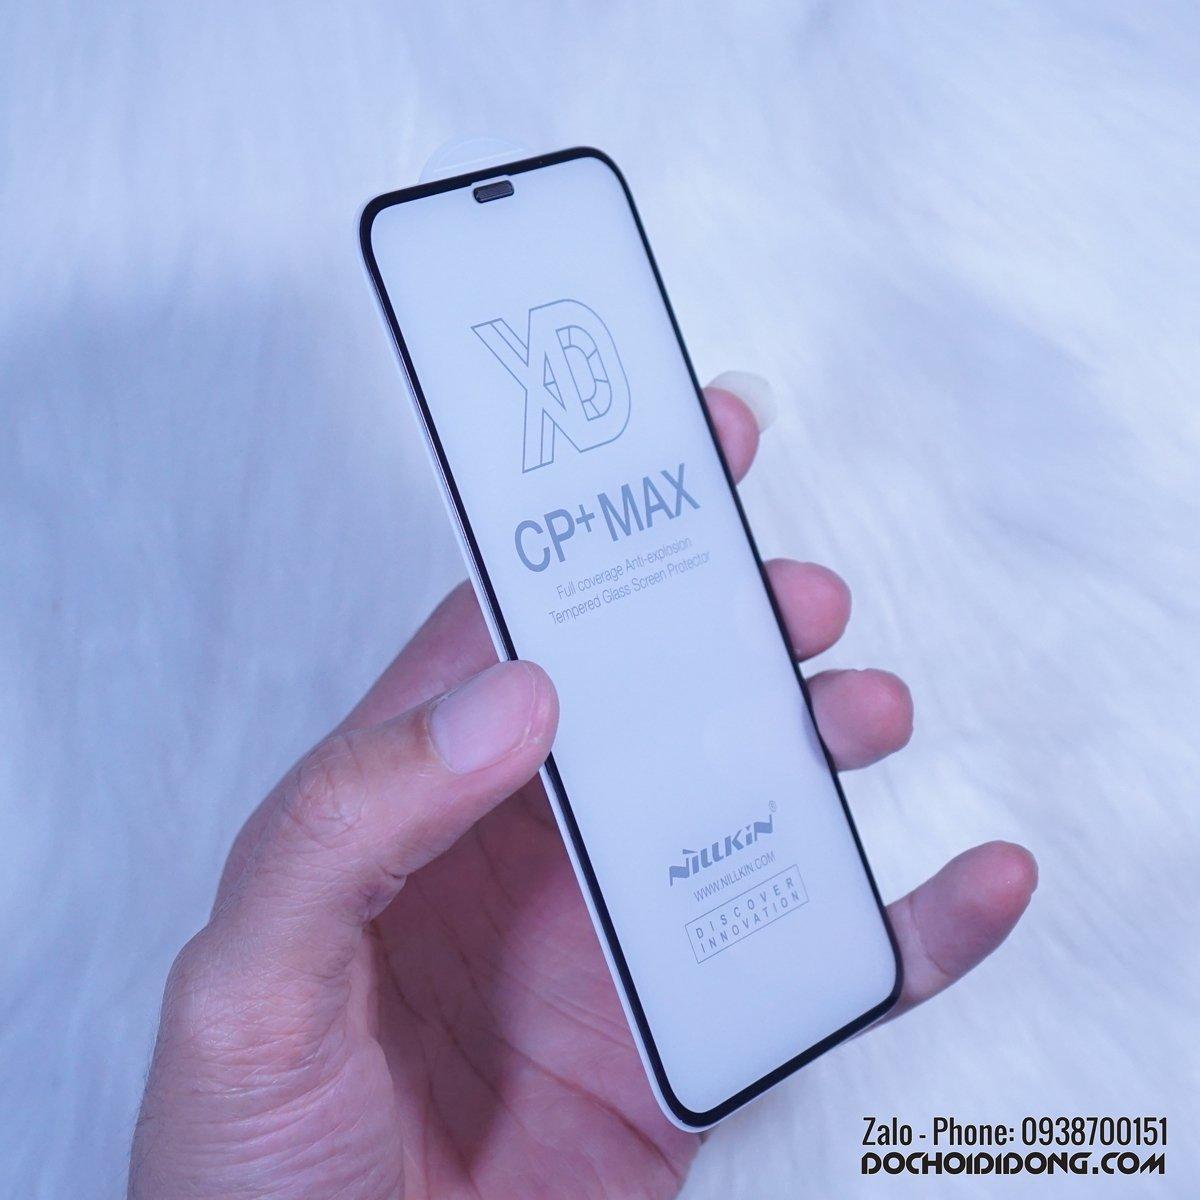 mieng-dan-cuong-luc-iphone-11-pro-nillkin-xd-cp-max-full-man-hinh